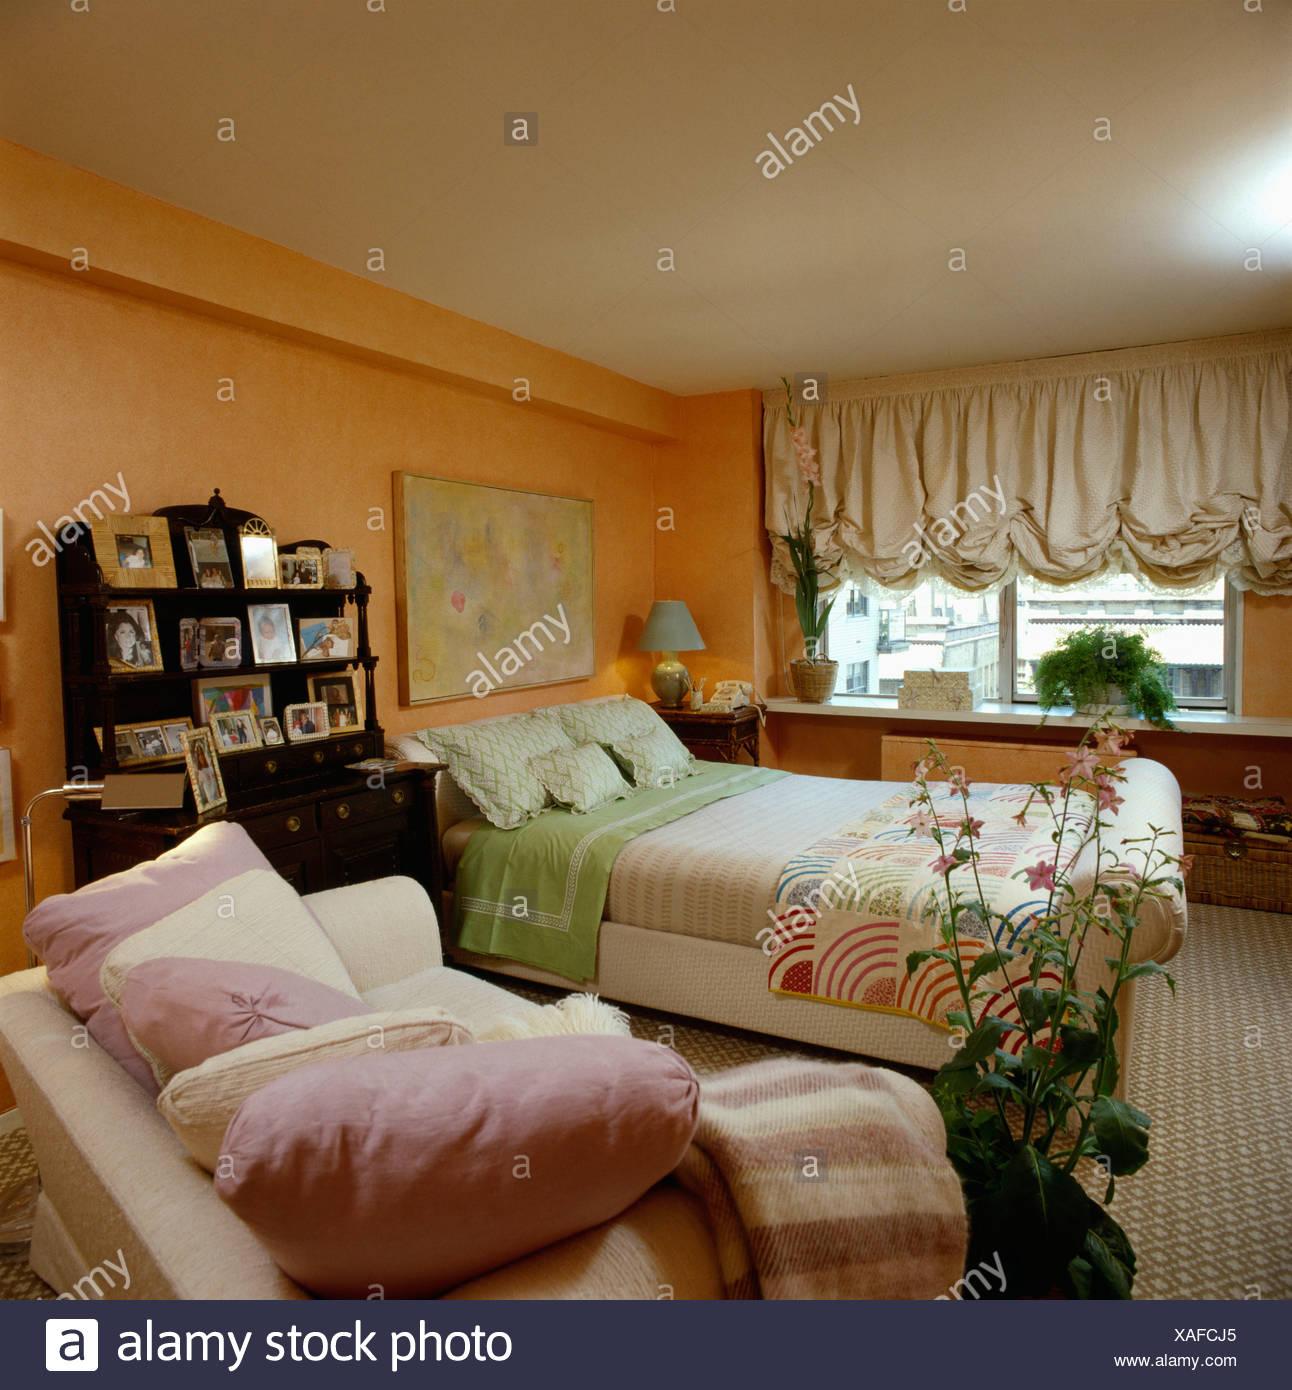 Cream festoon blind and orange walls in eighties bedroom ...